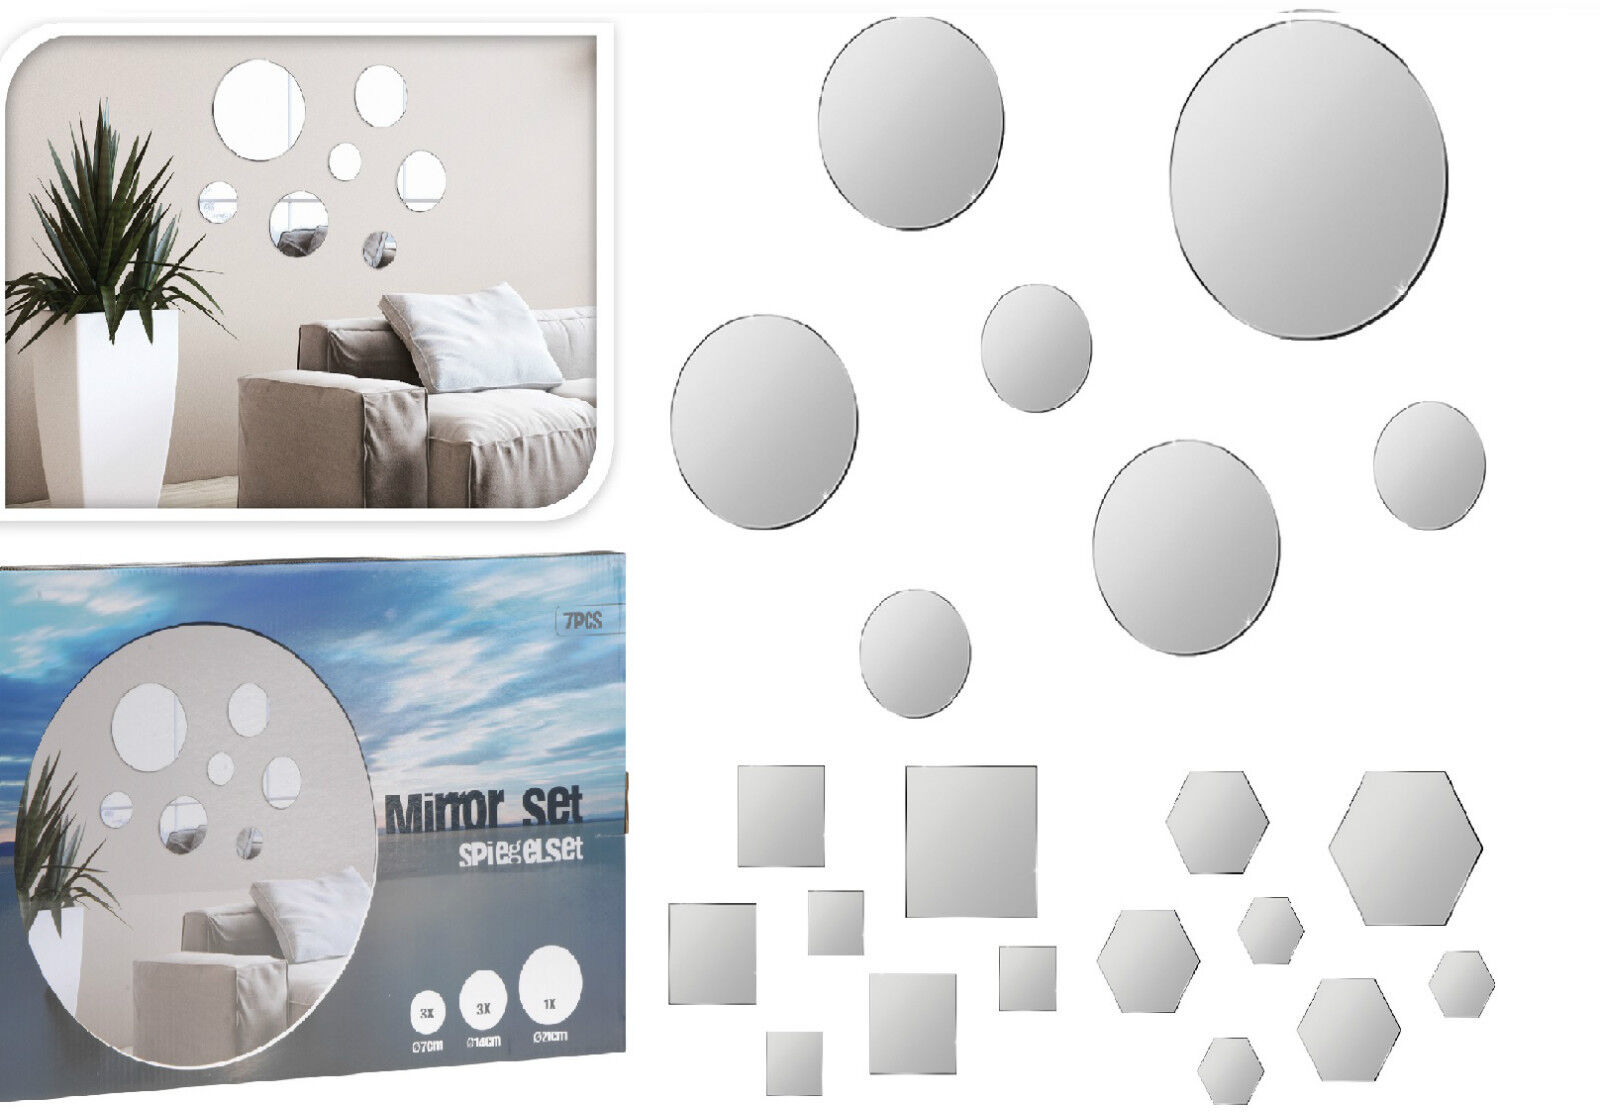 spiegel wandspiegel 7tlg spiegel zum kleben 4 eckig sp02 eur 7 69 picclick de. Black Bedroom Furniture Sets. Home Design Ideas